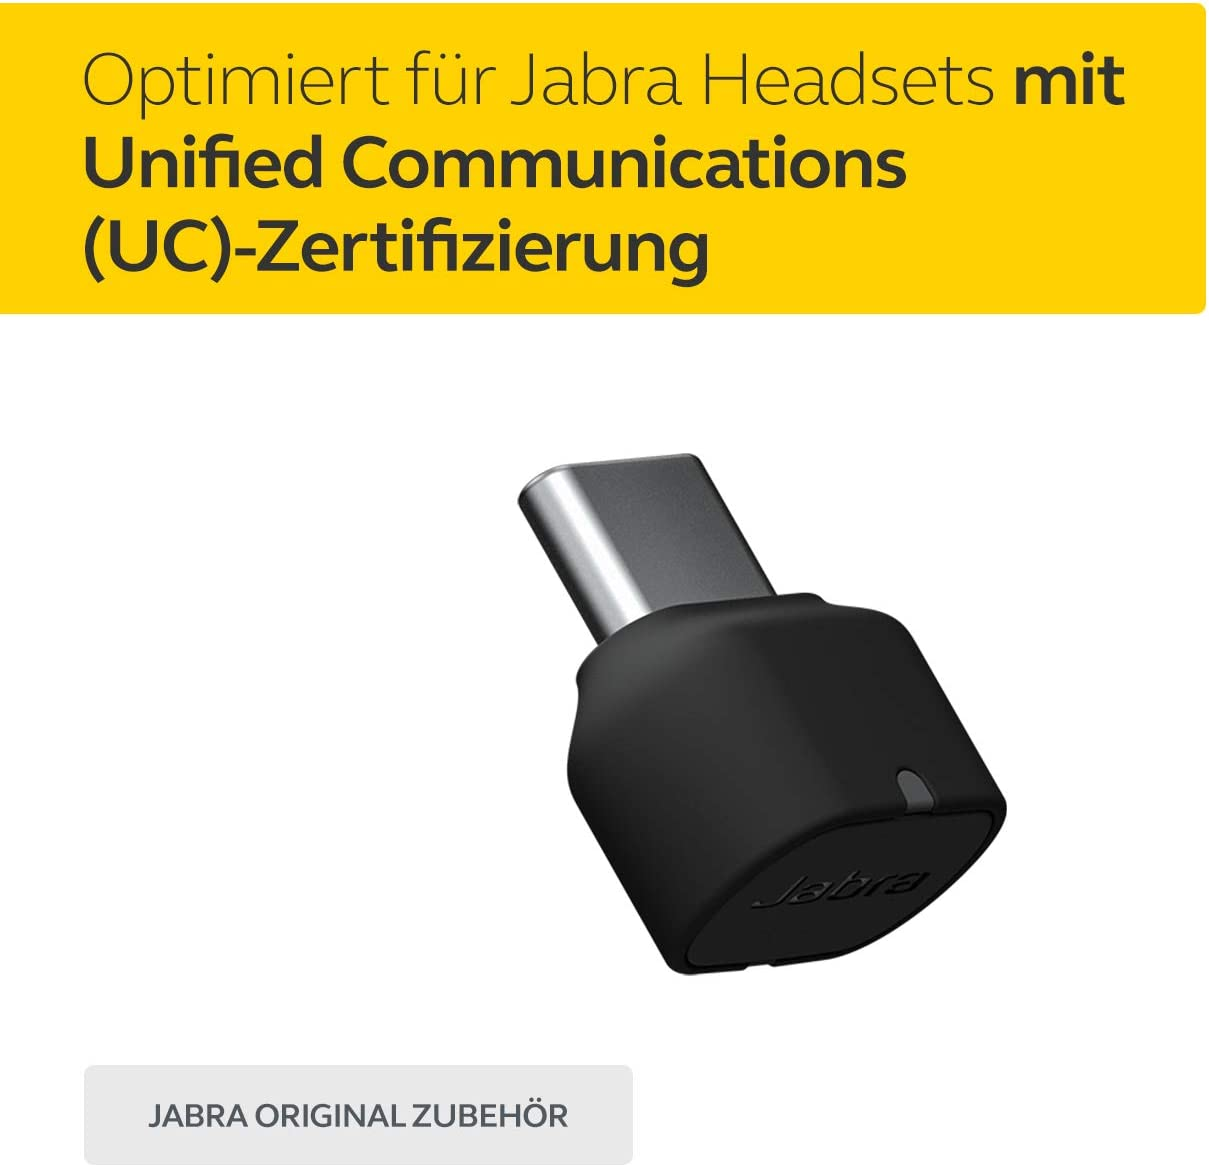 Jabra Link 380c Uc Usb C Bluetooth Adapter Wireless Dongle For Evolve2 85 And 65 Headsets Elektronik